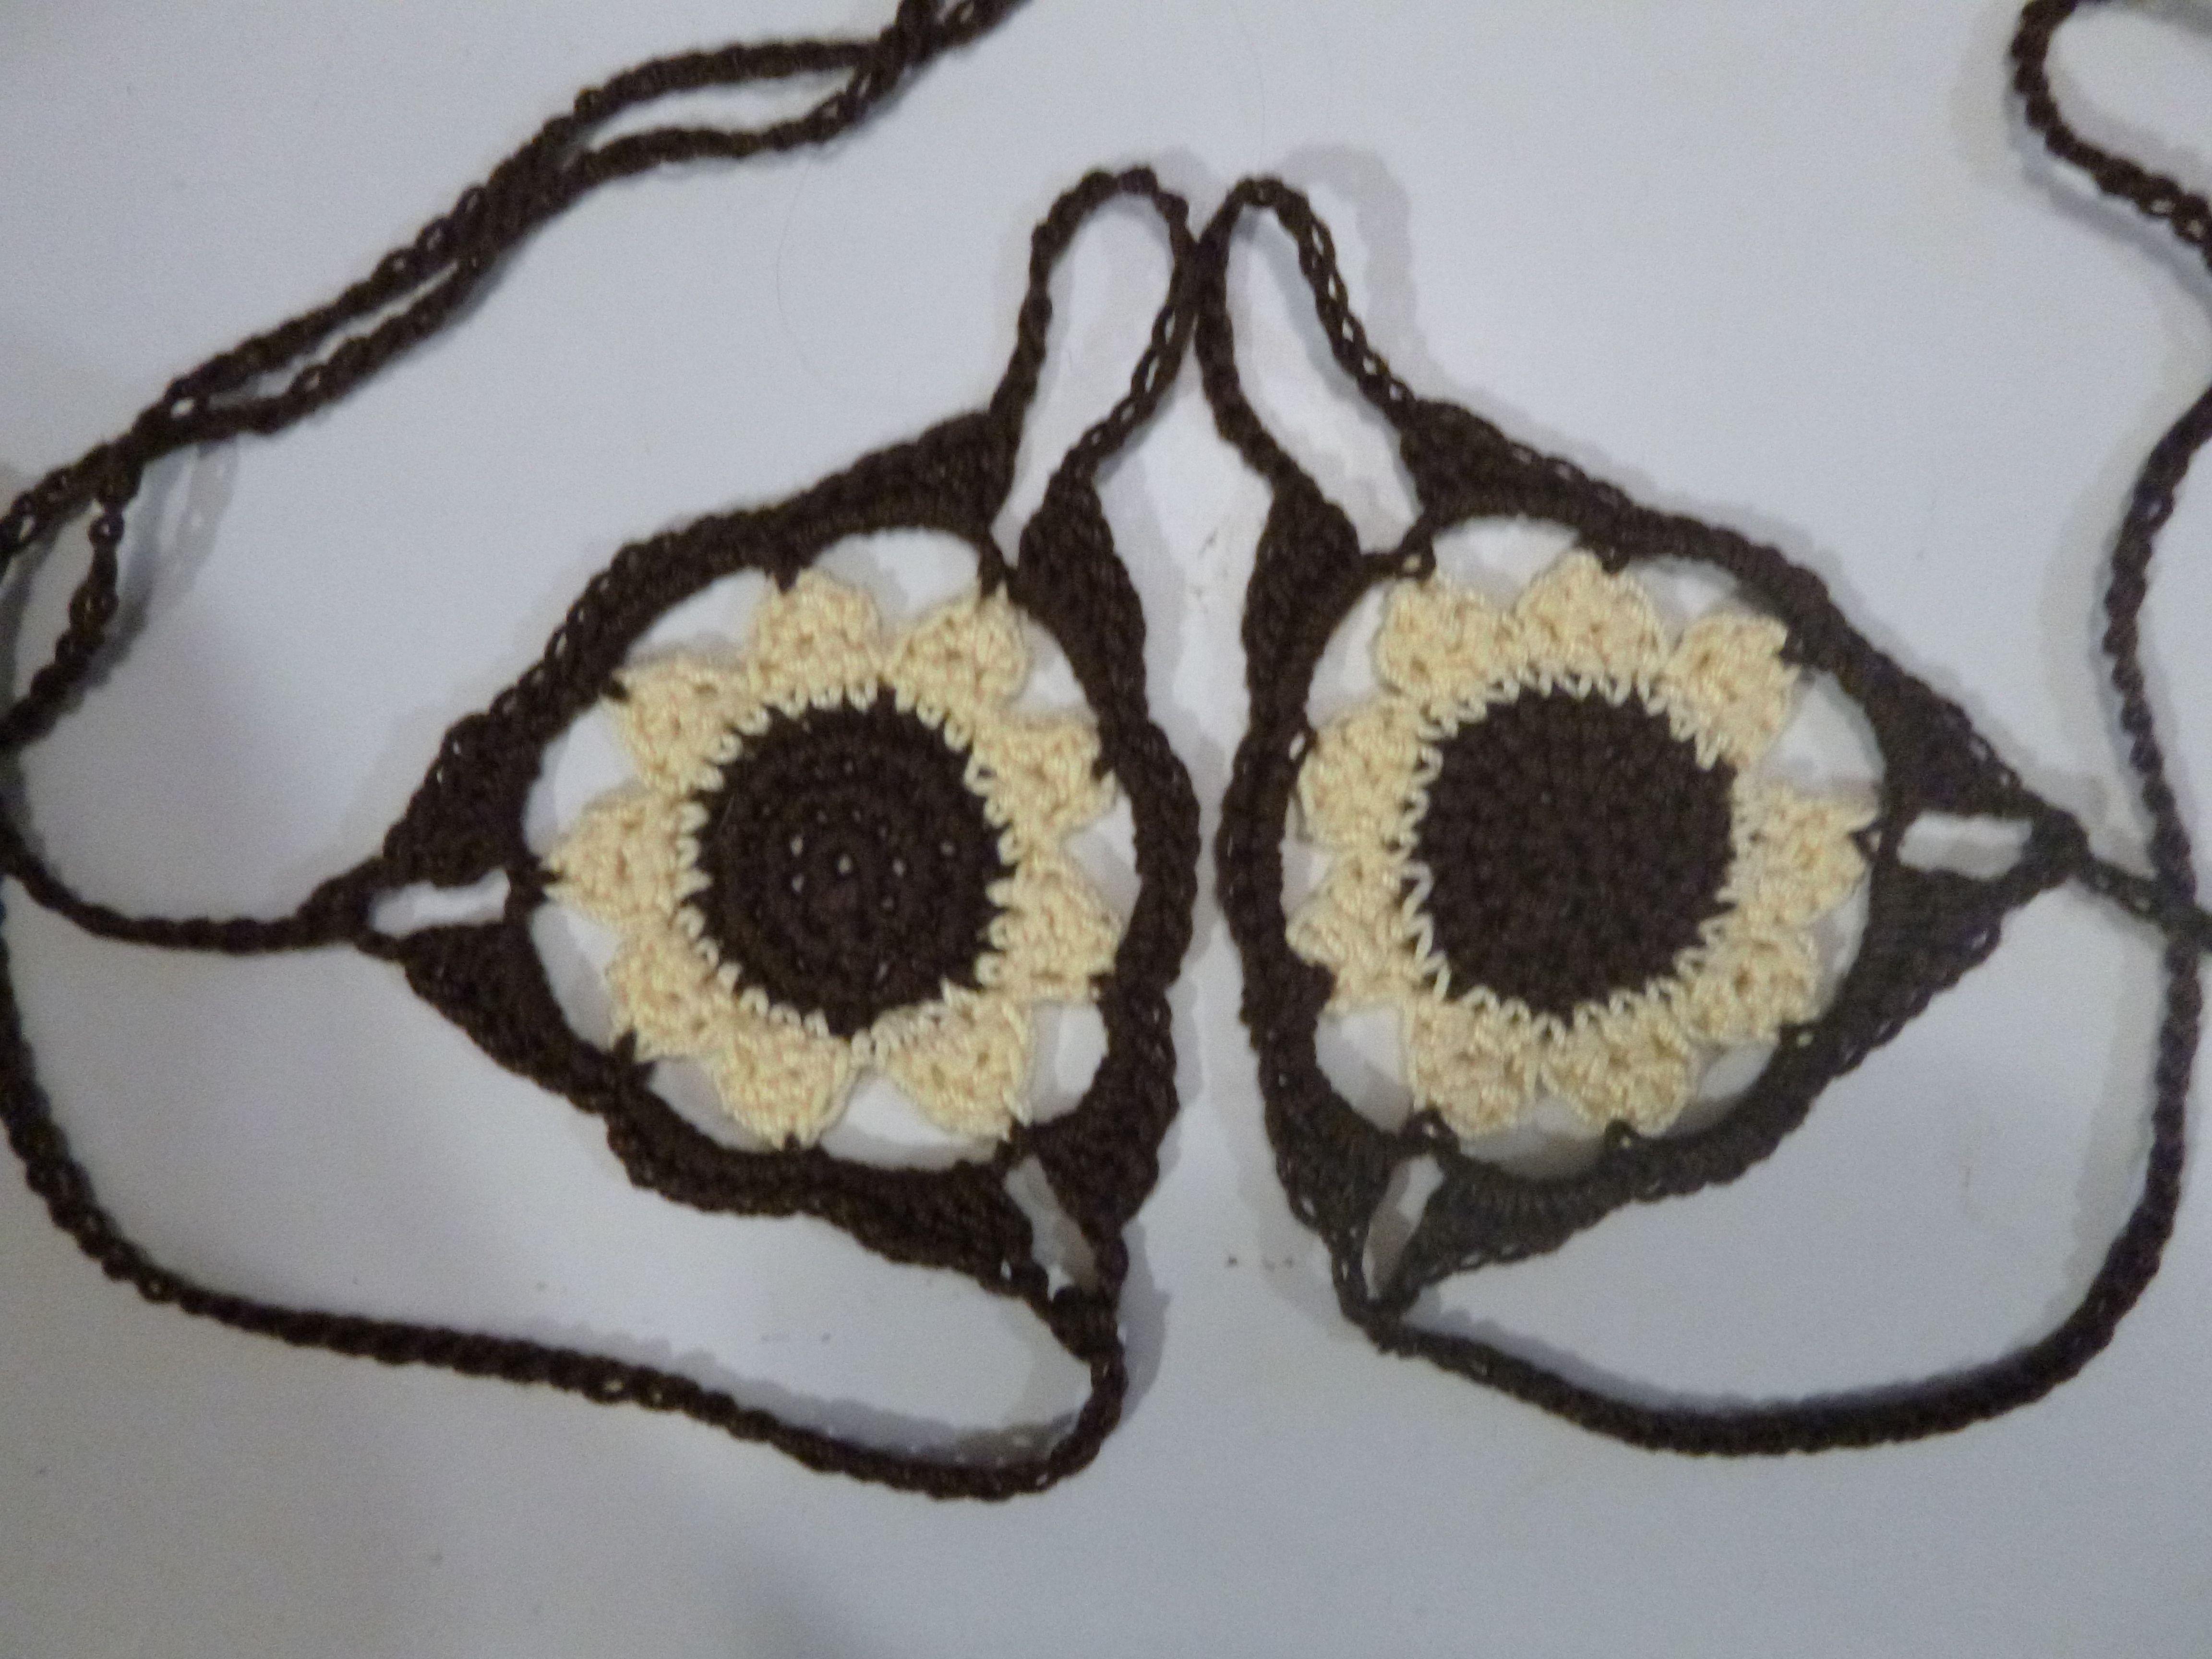 Pin de I Tangle Yarn en designs by donna b | Pinterest